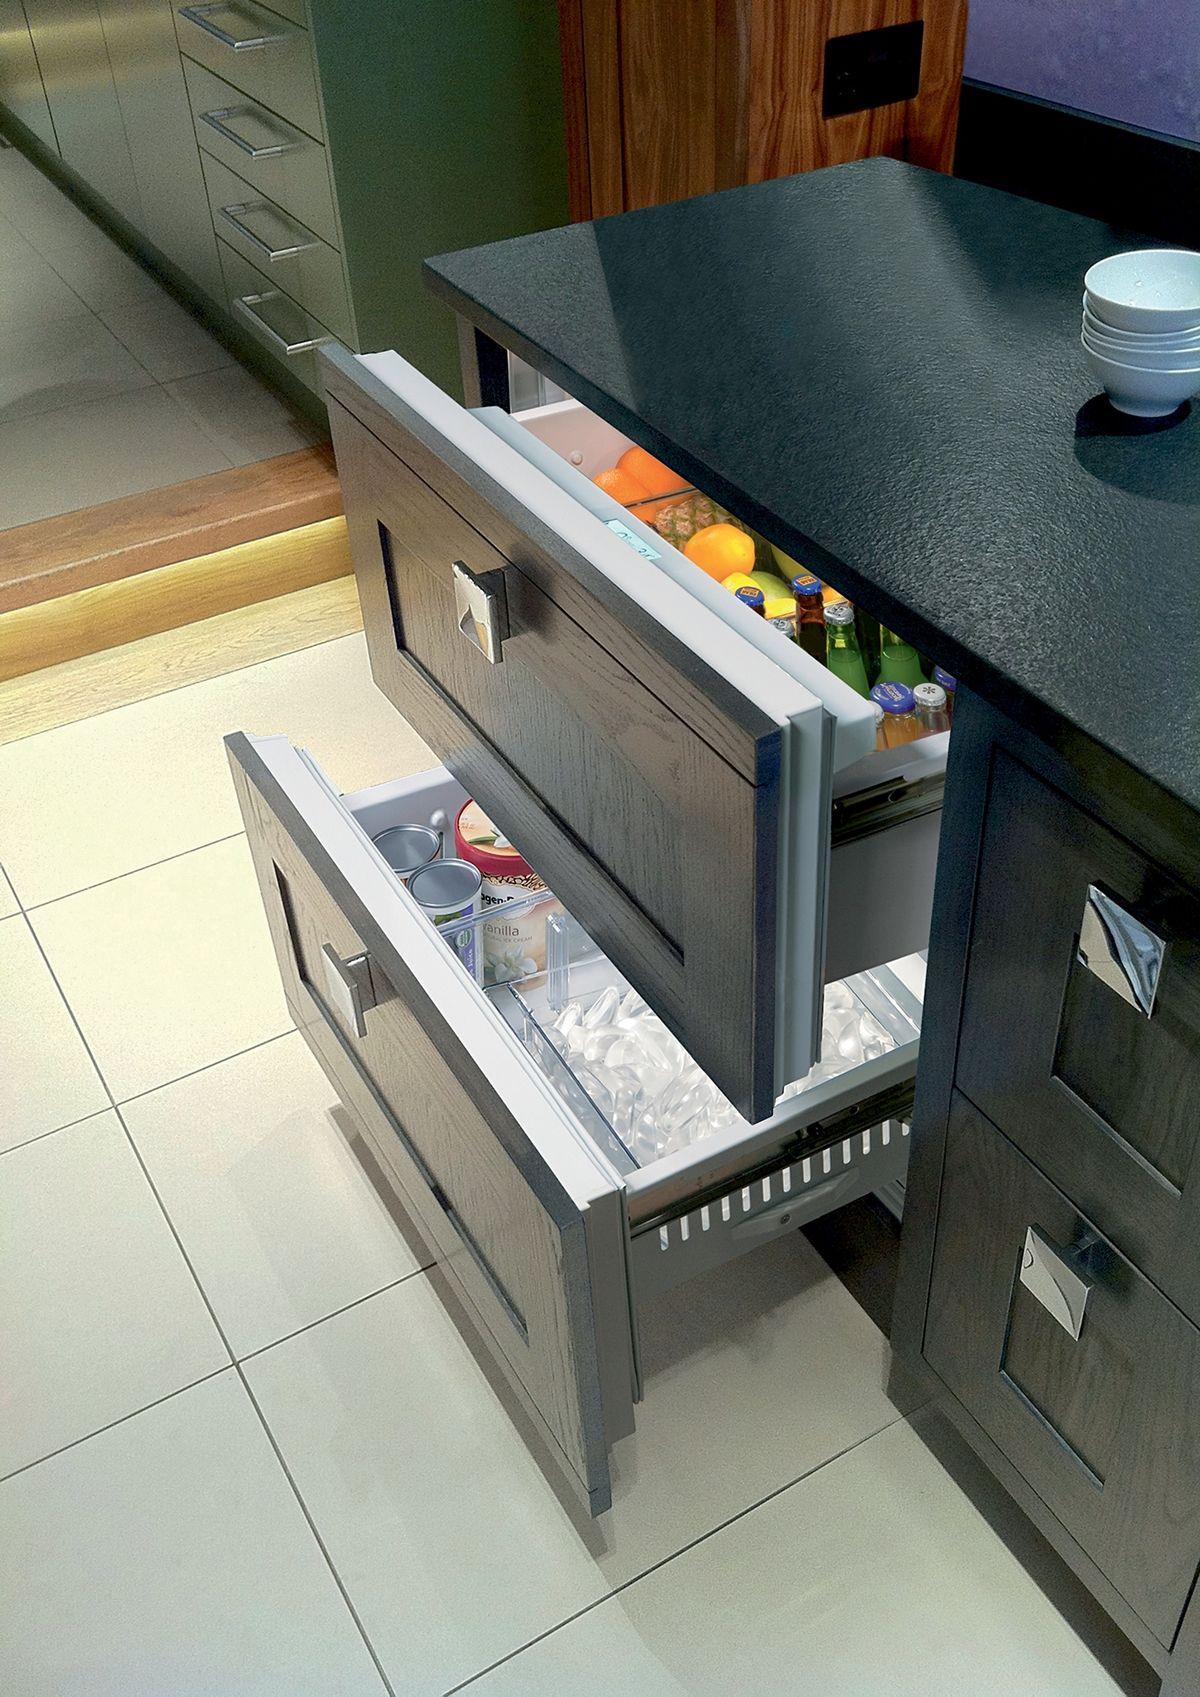 Sub Zero 36 Designer Refrigerator Freezer Drawers With Ice Maker Panel Ready Id 36ci Refrigerator Drawers Refrigerator Freezer Fridge Drawers